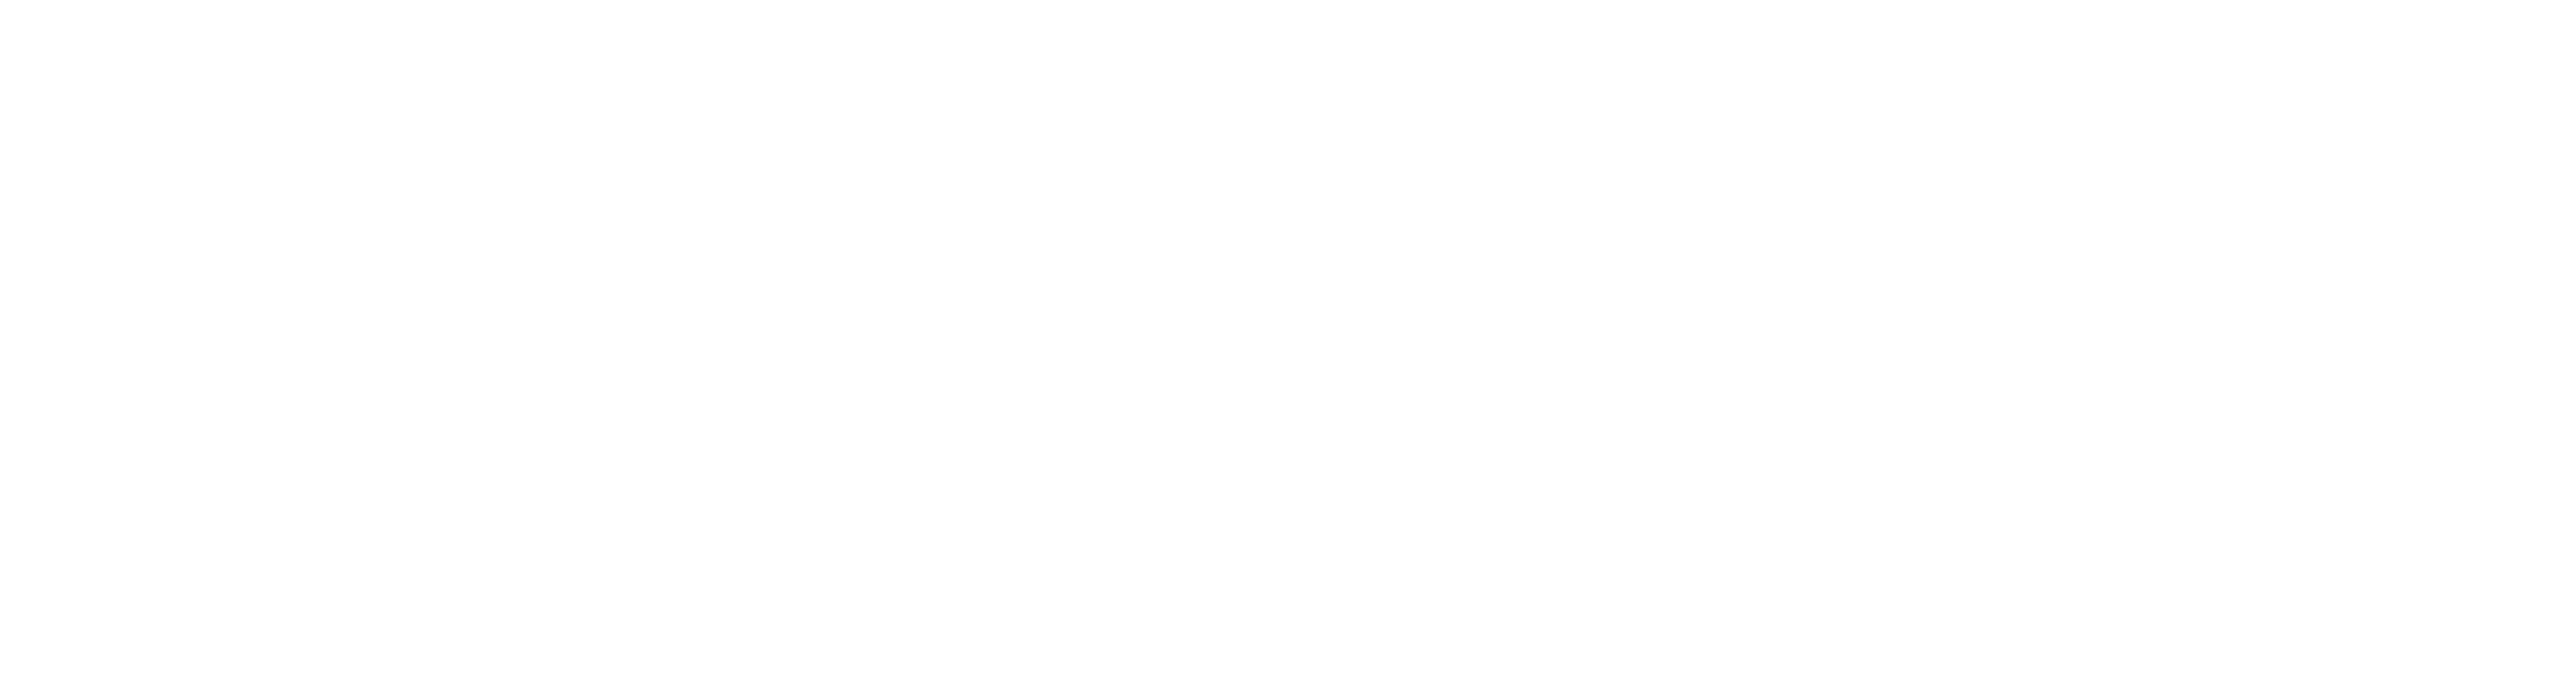 2018-05-24 - 262 Melbourne St White